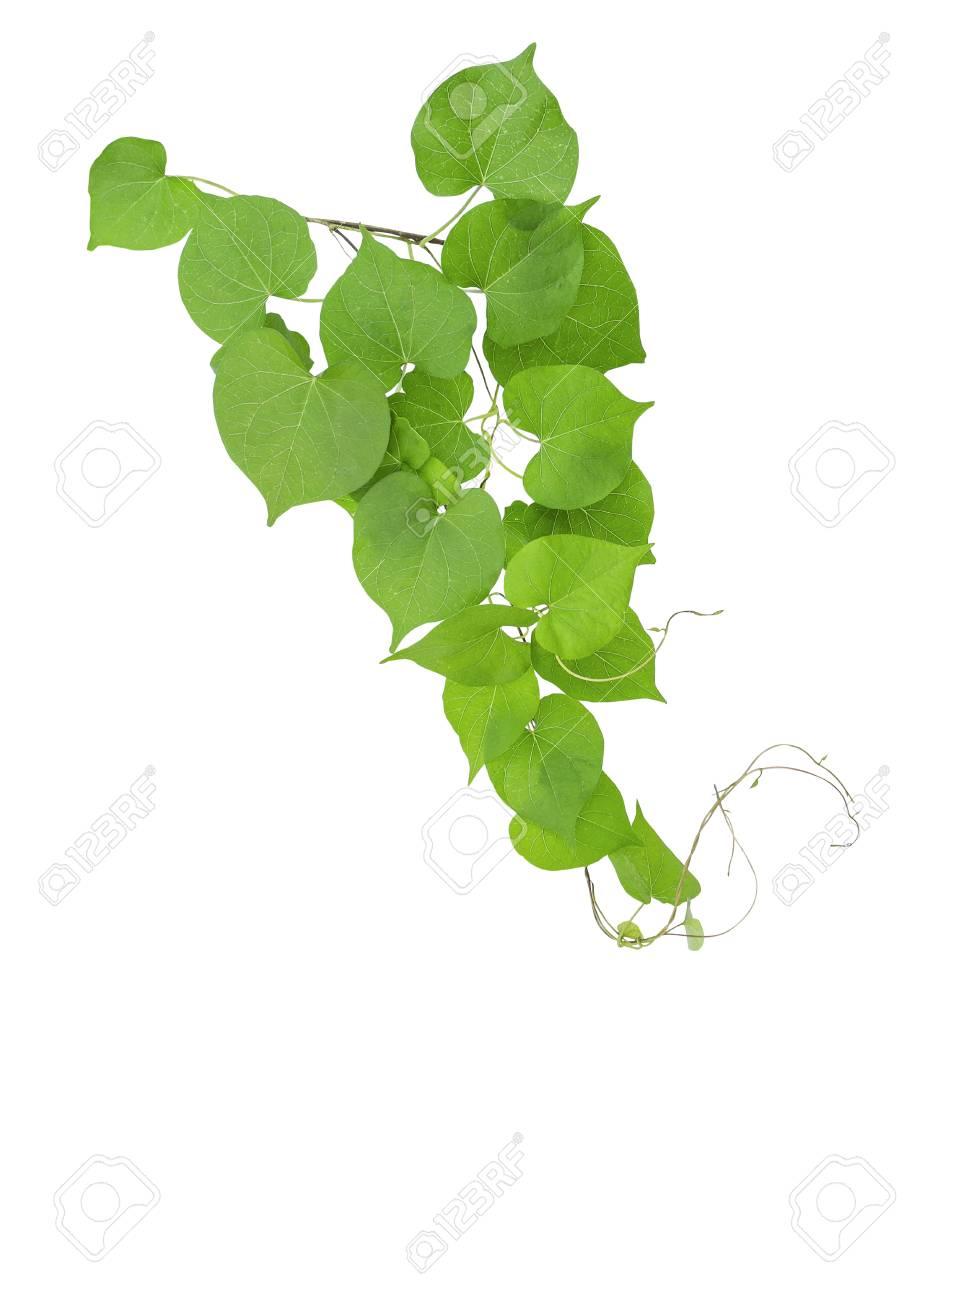 Heart shaped greenery leaves tropical wild vine with branches heart shaped greenery leaves tropical wild vine with branches isolated on white background stock photo mightylinksfo